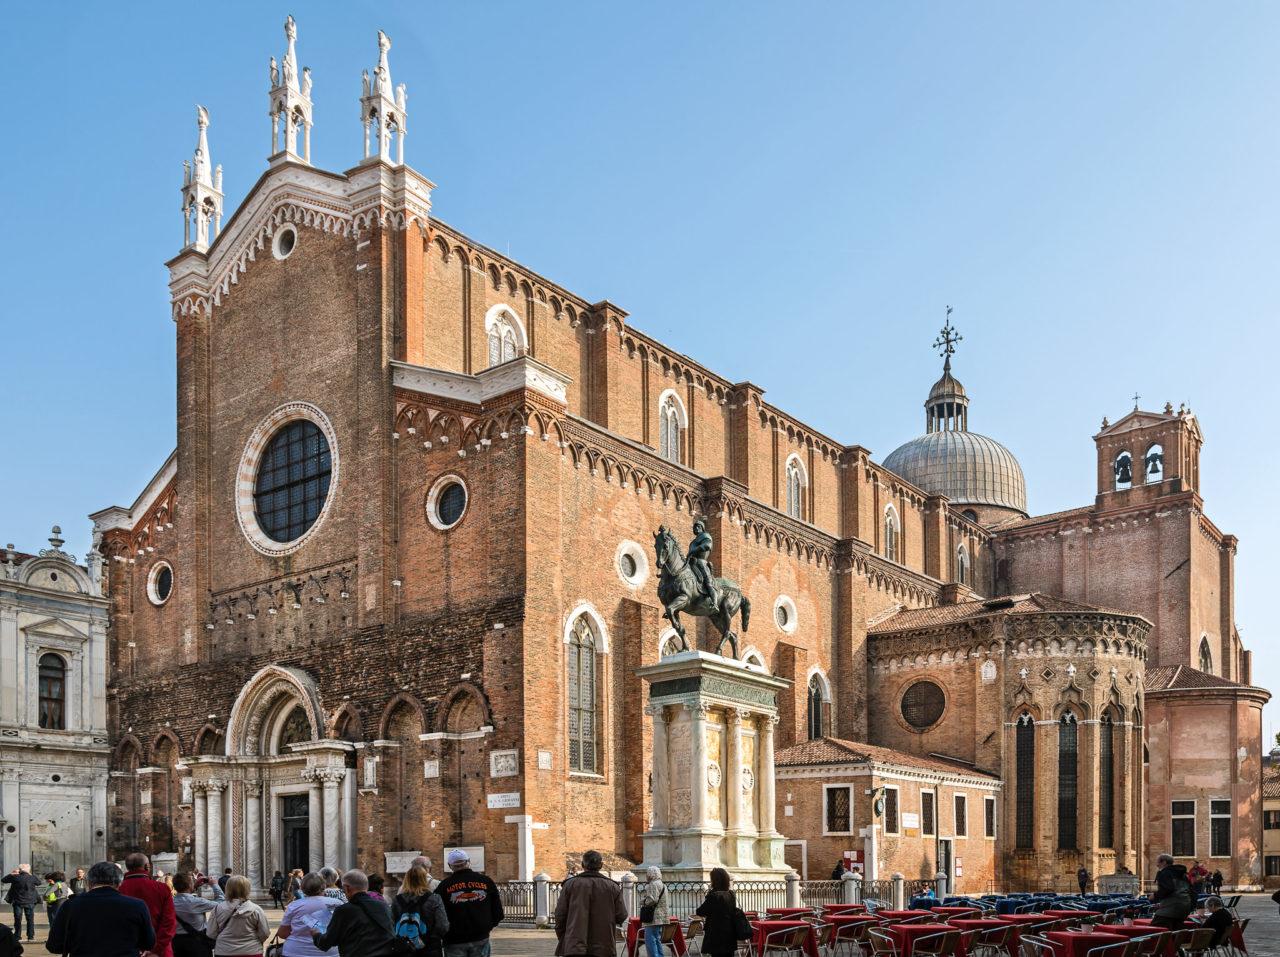 Базилика Санти-Джованни э Паоло (Basilica dei Santi Giovanni e Paolo)